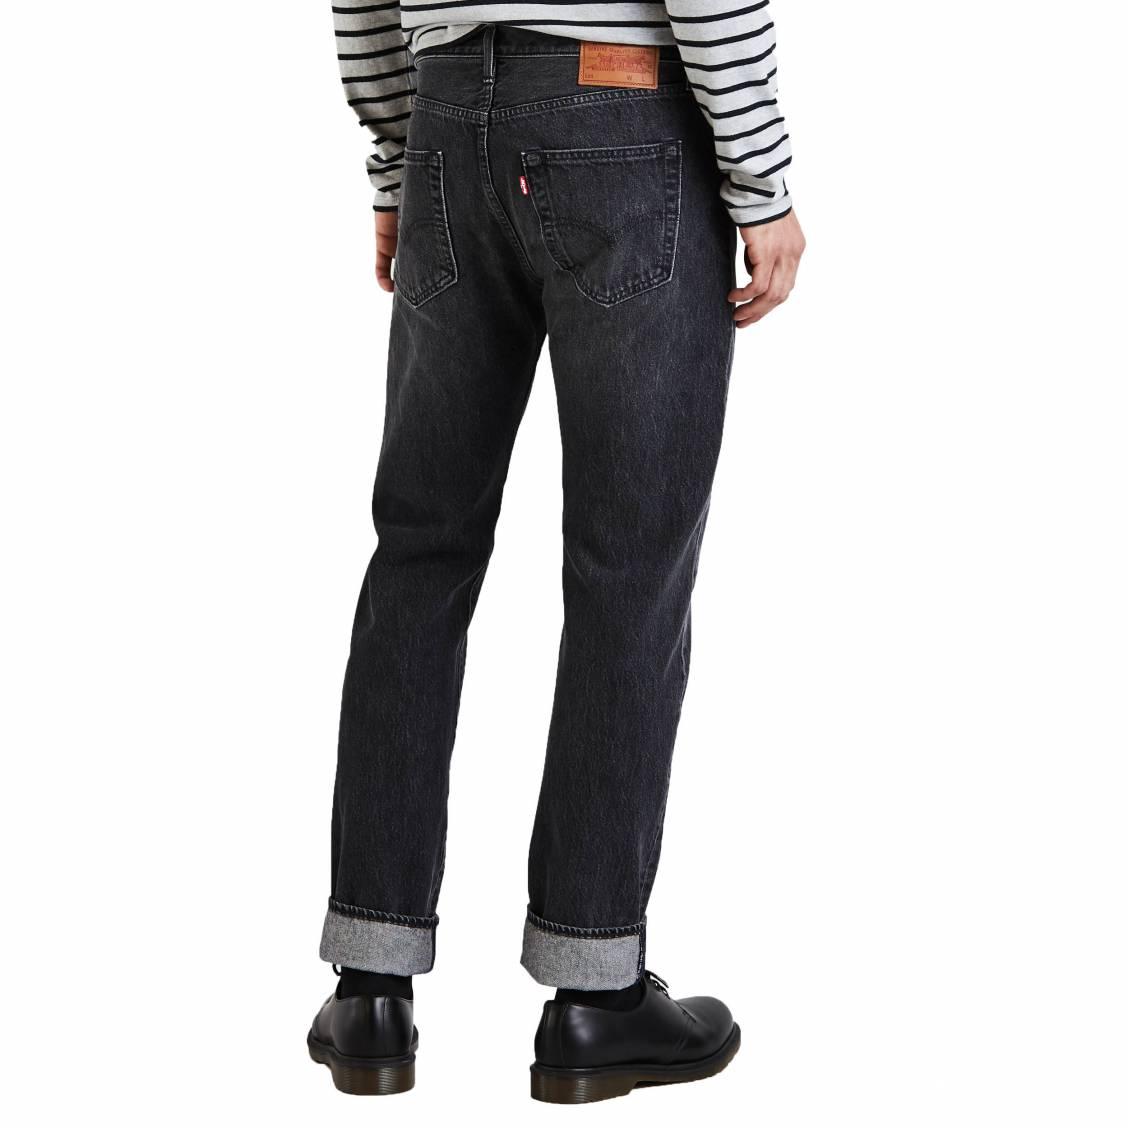 089a1ba2b04 Jean Levis 501 Original fit Mlk Warp en coton stretch gris fonce-3-0 1128x1128.jpg